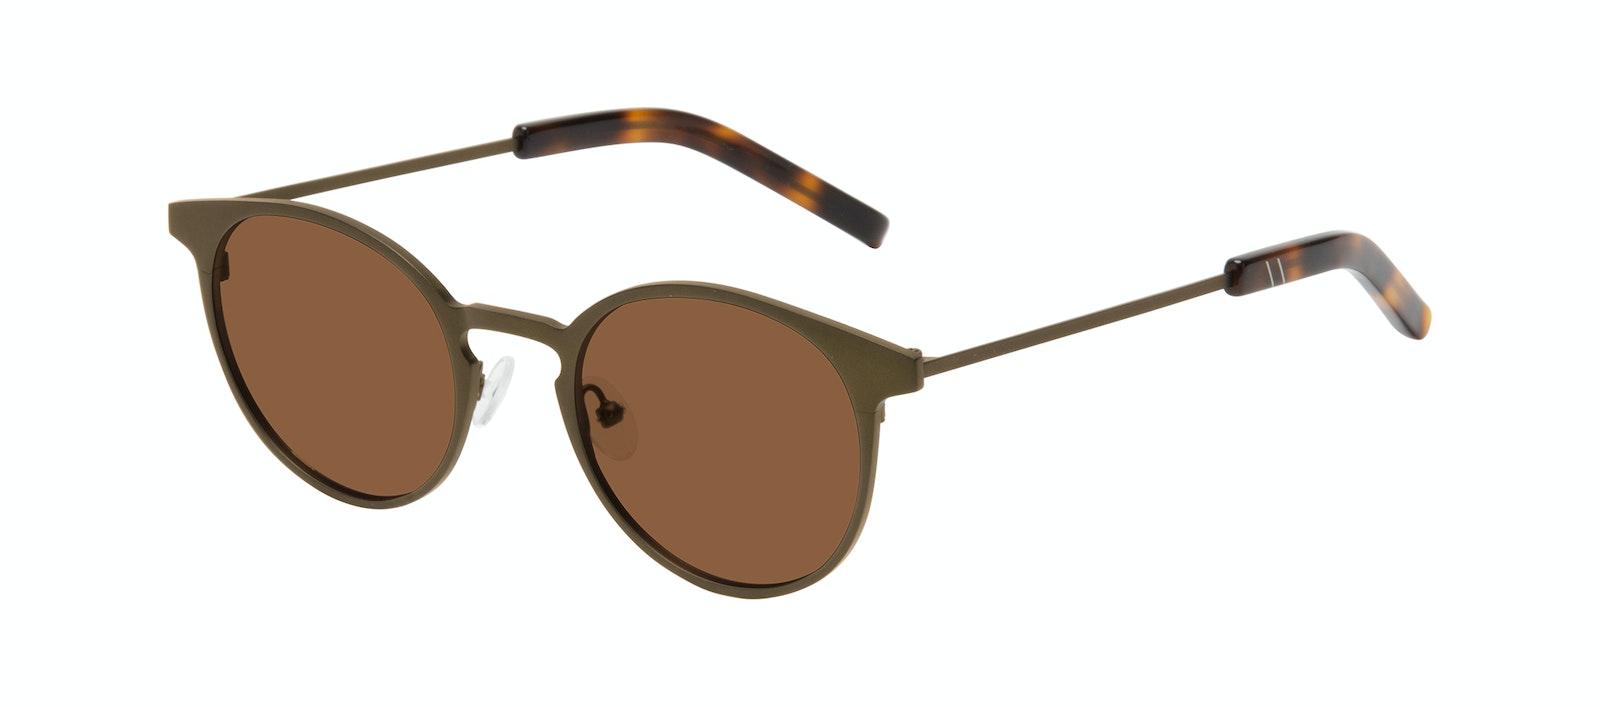 Affordable Fashion Glasses Round Sunglasses Men Cut Khaki Tilt